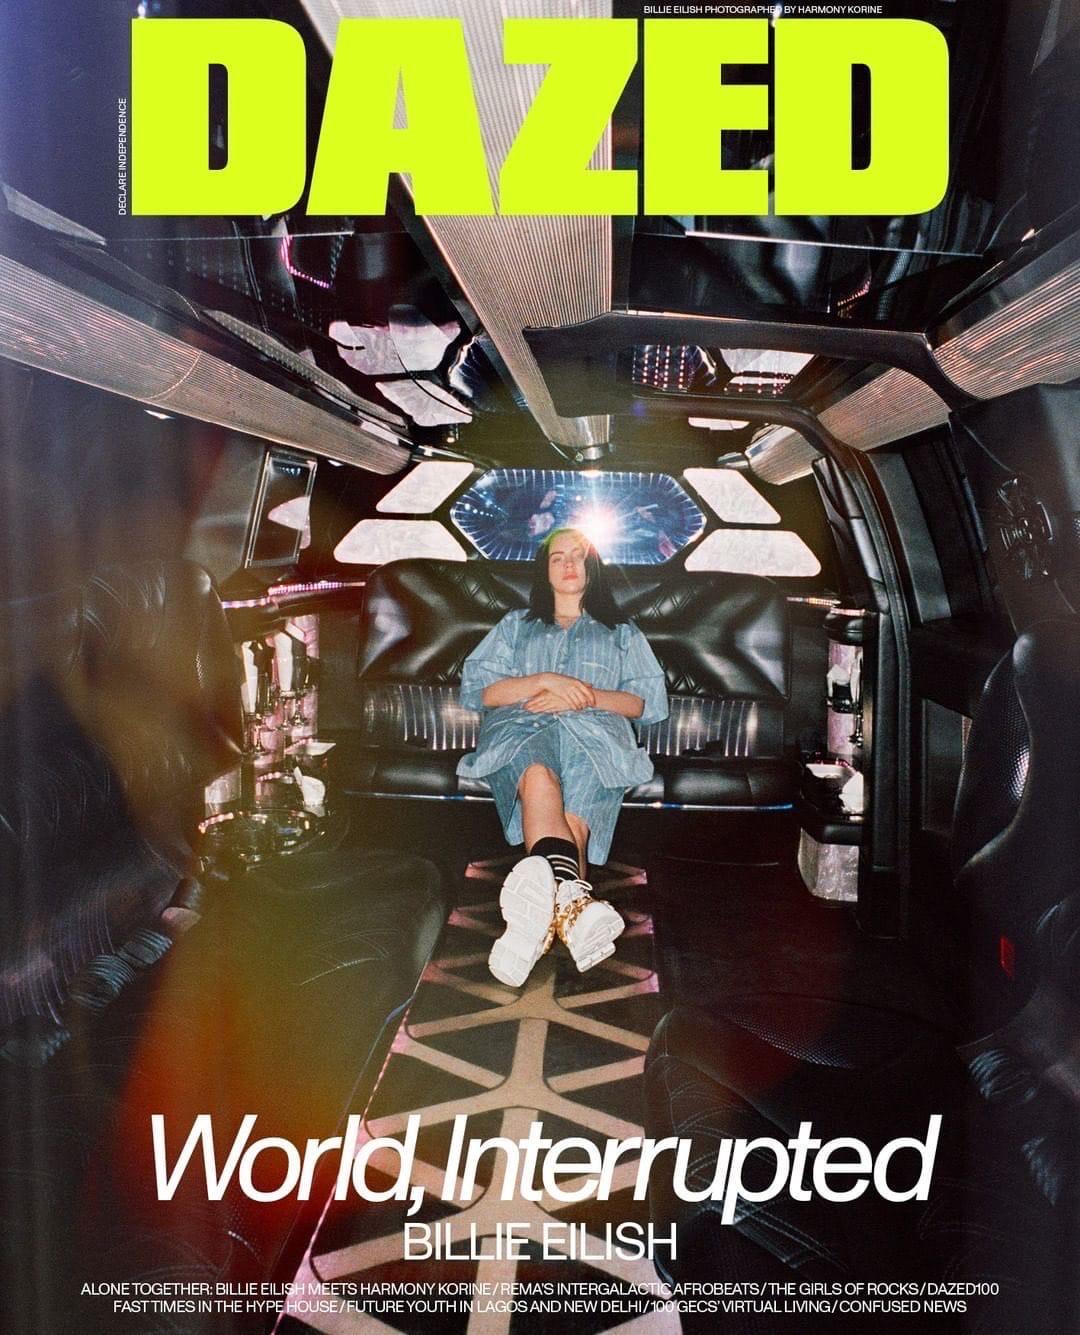 Billie Eilish Dazed 2020 1 - Фото: Билли Айлиш на обложке журнала Dazed